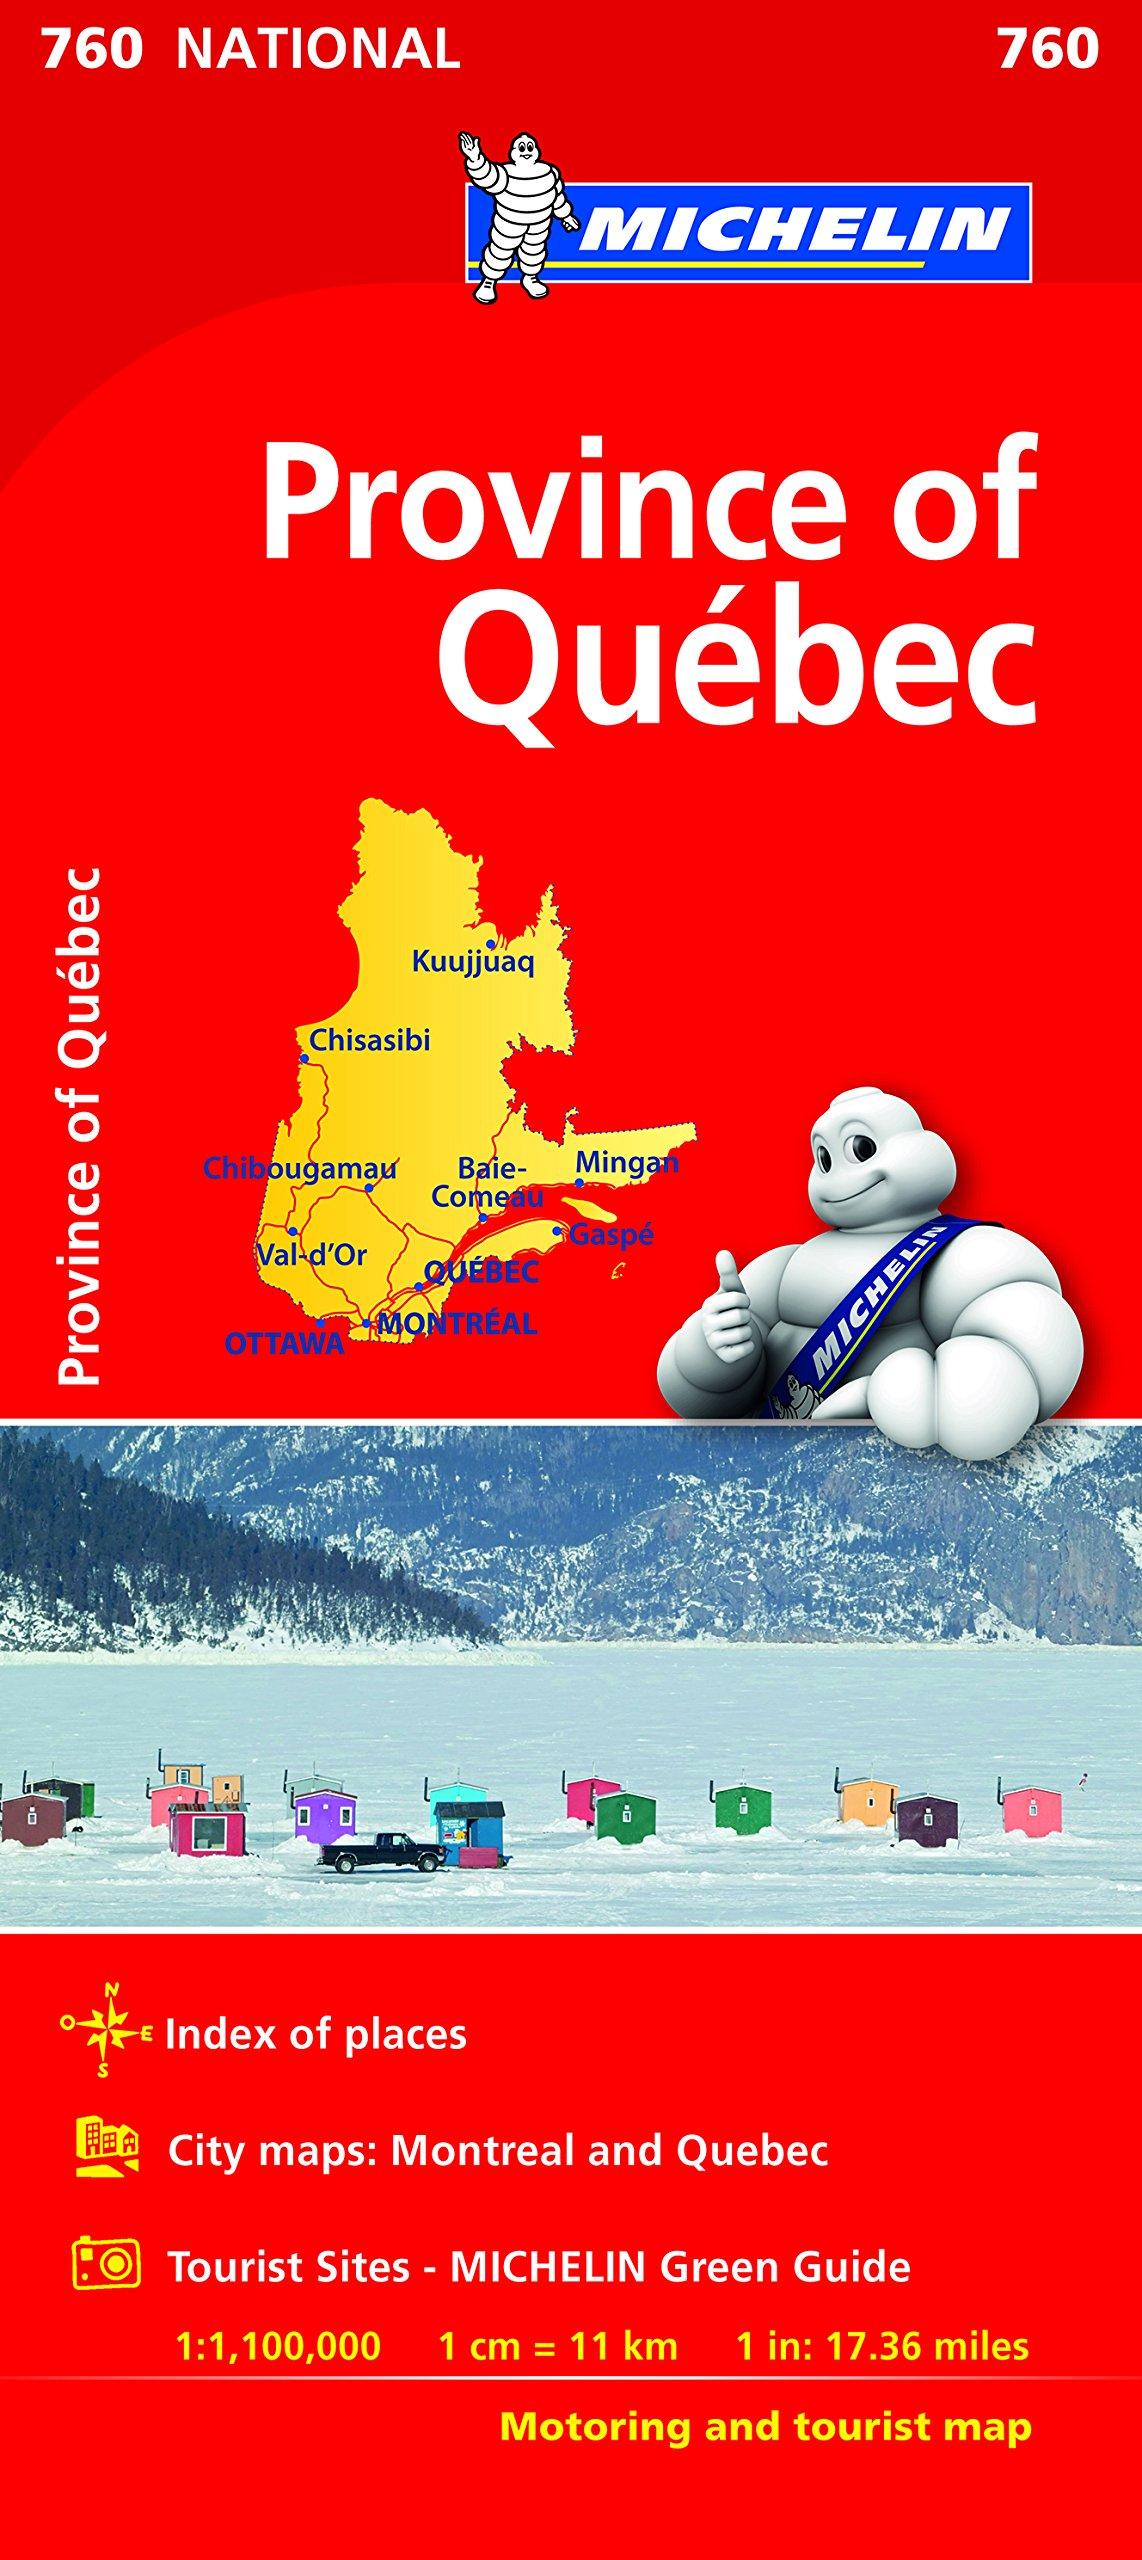 Quebec 760